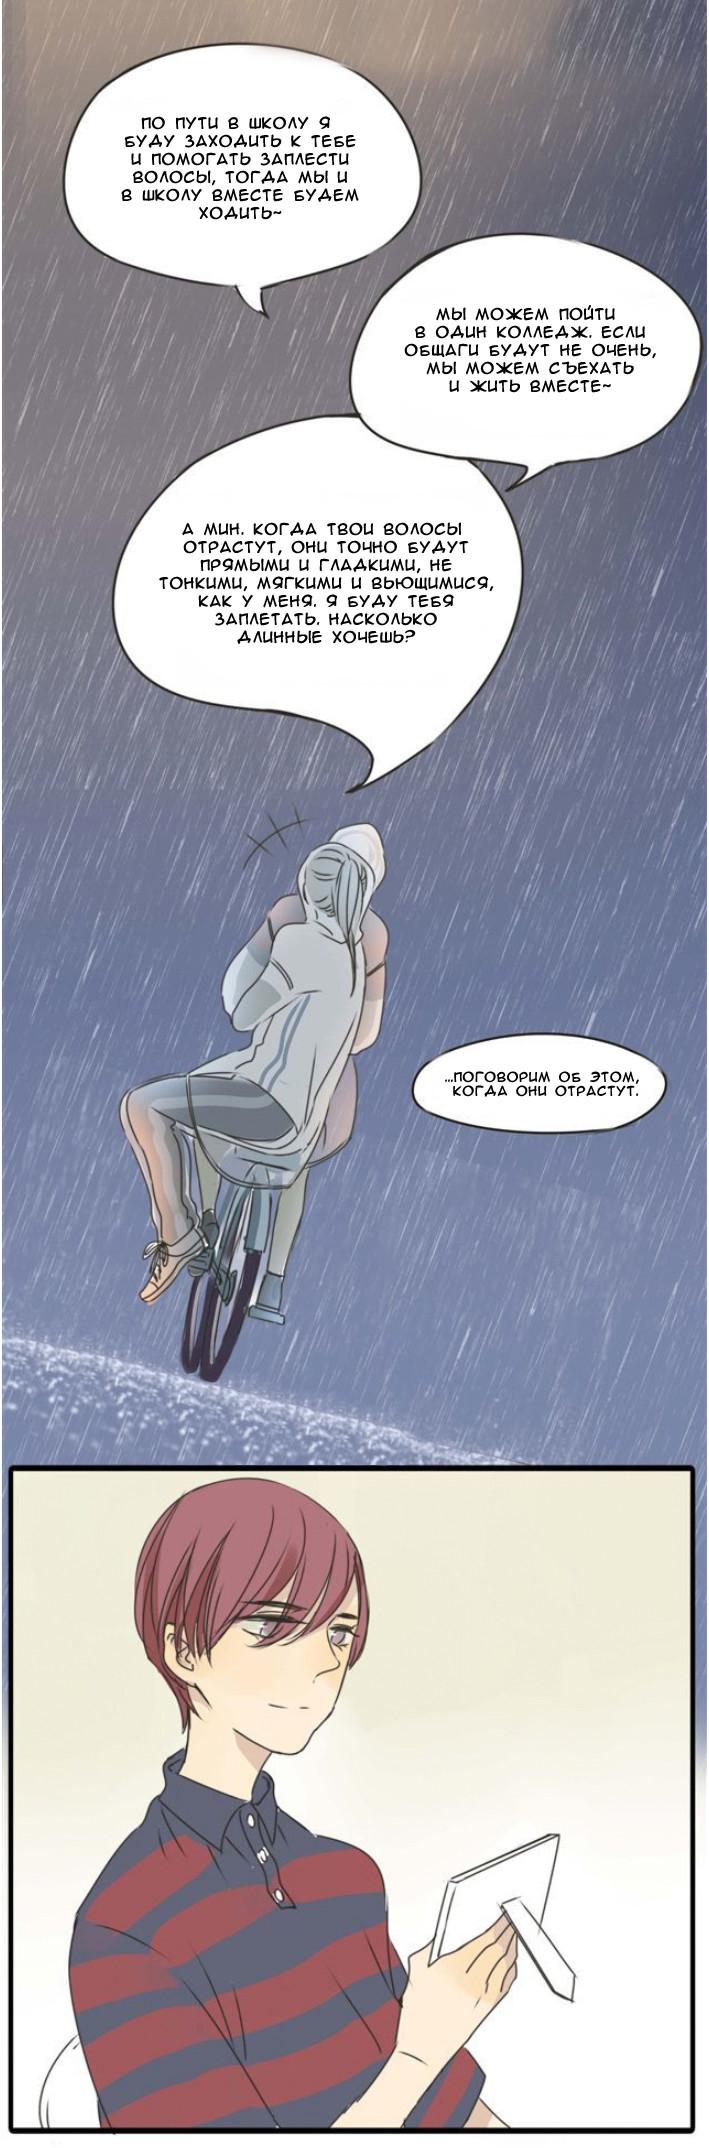 https://r1.ninemanga.com/comics/pic2/20/30804/319467/1488284649622.jpg Page 2